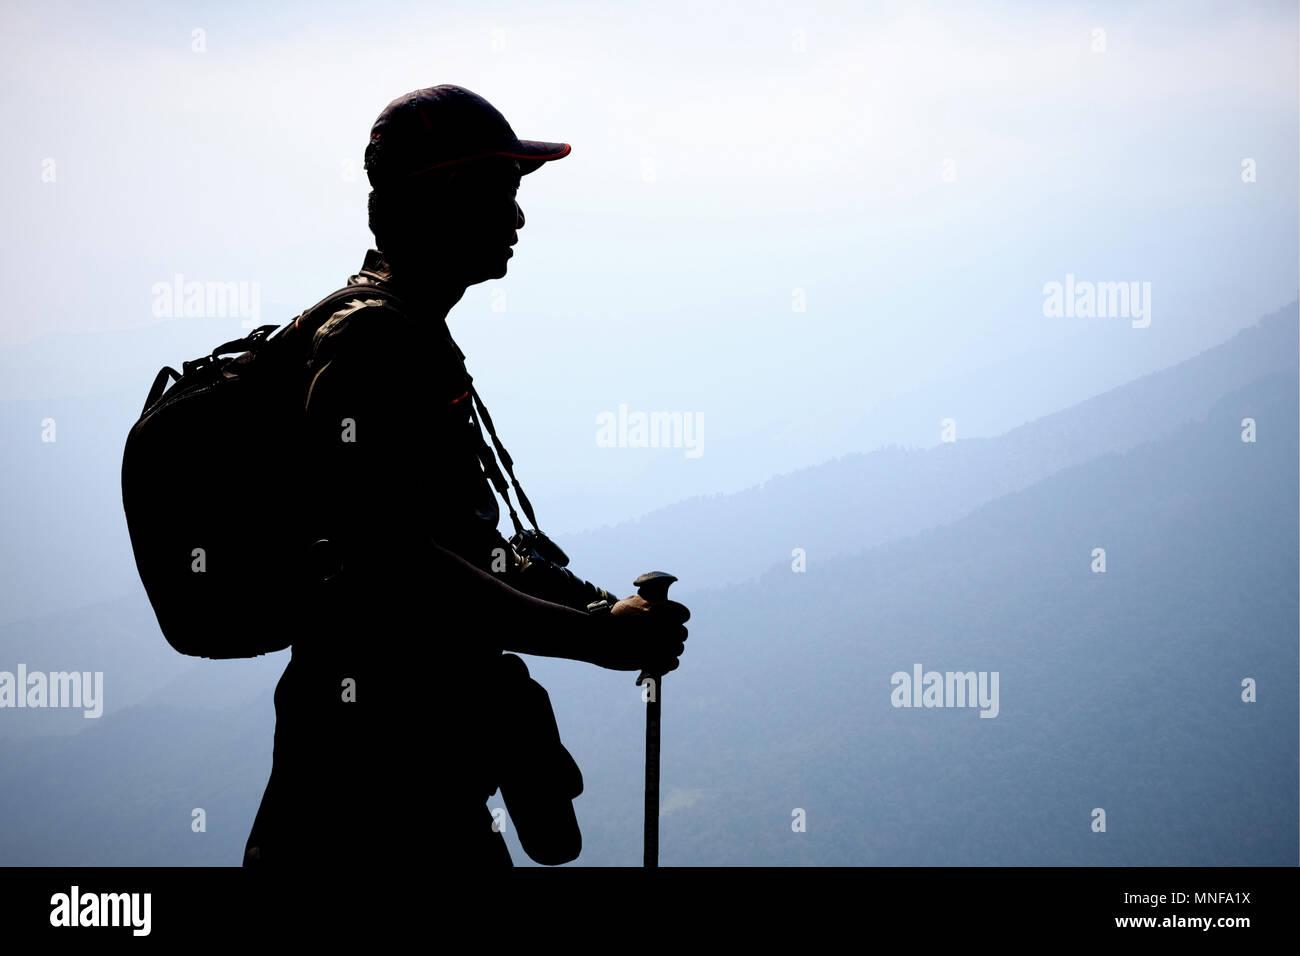 Silhouette trekker with backpack f934541ca299b